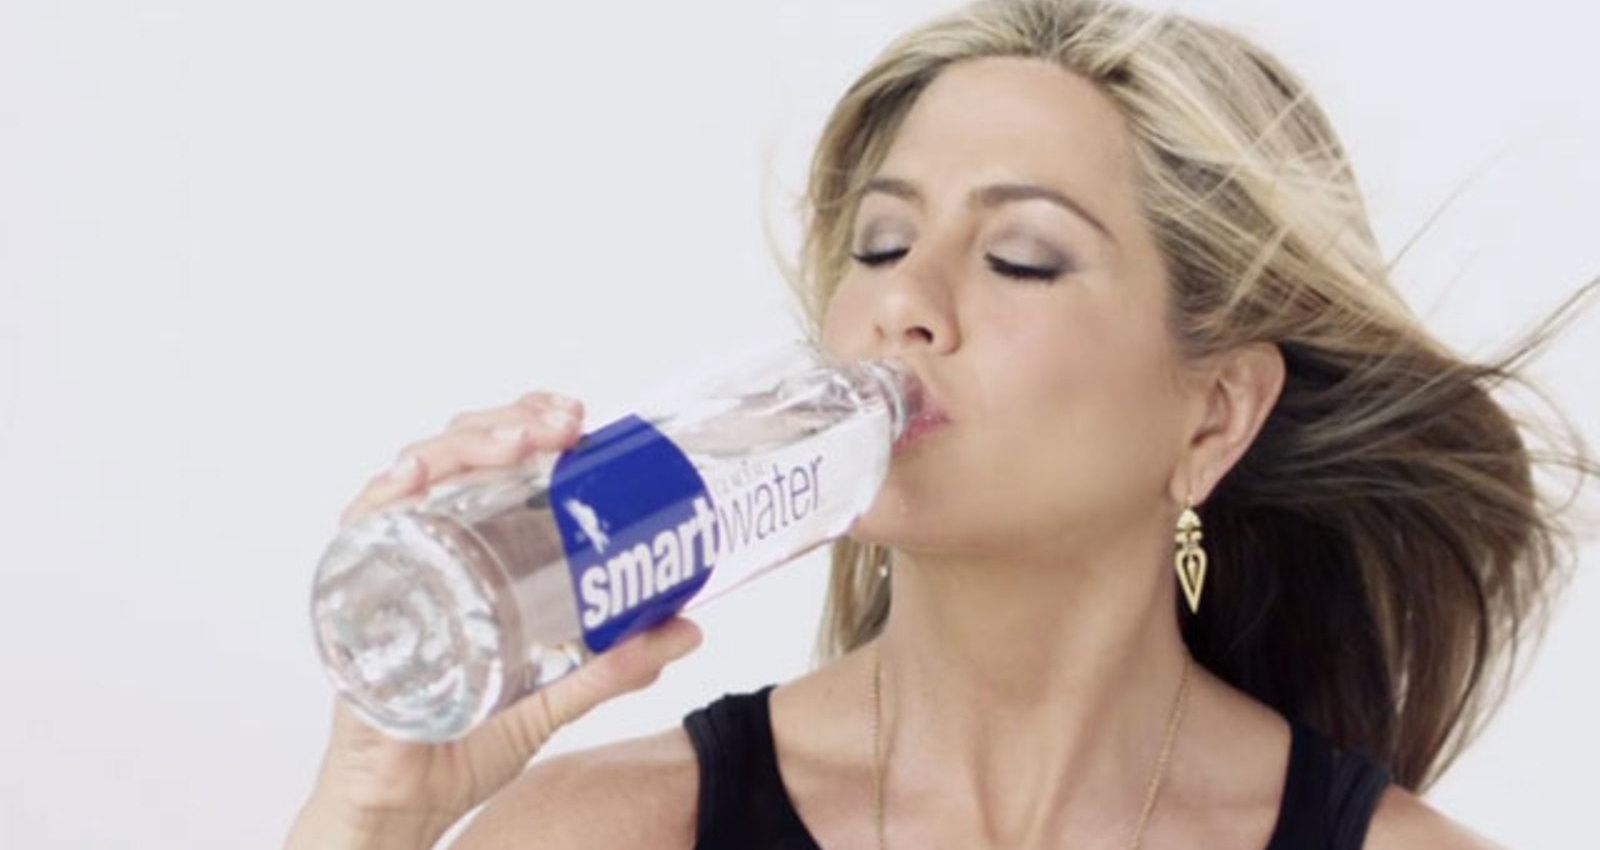 Jennifer Aniston Goes Viral